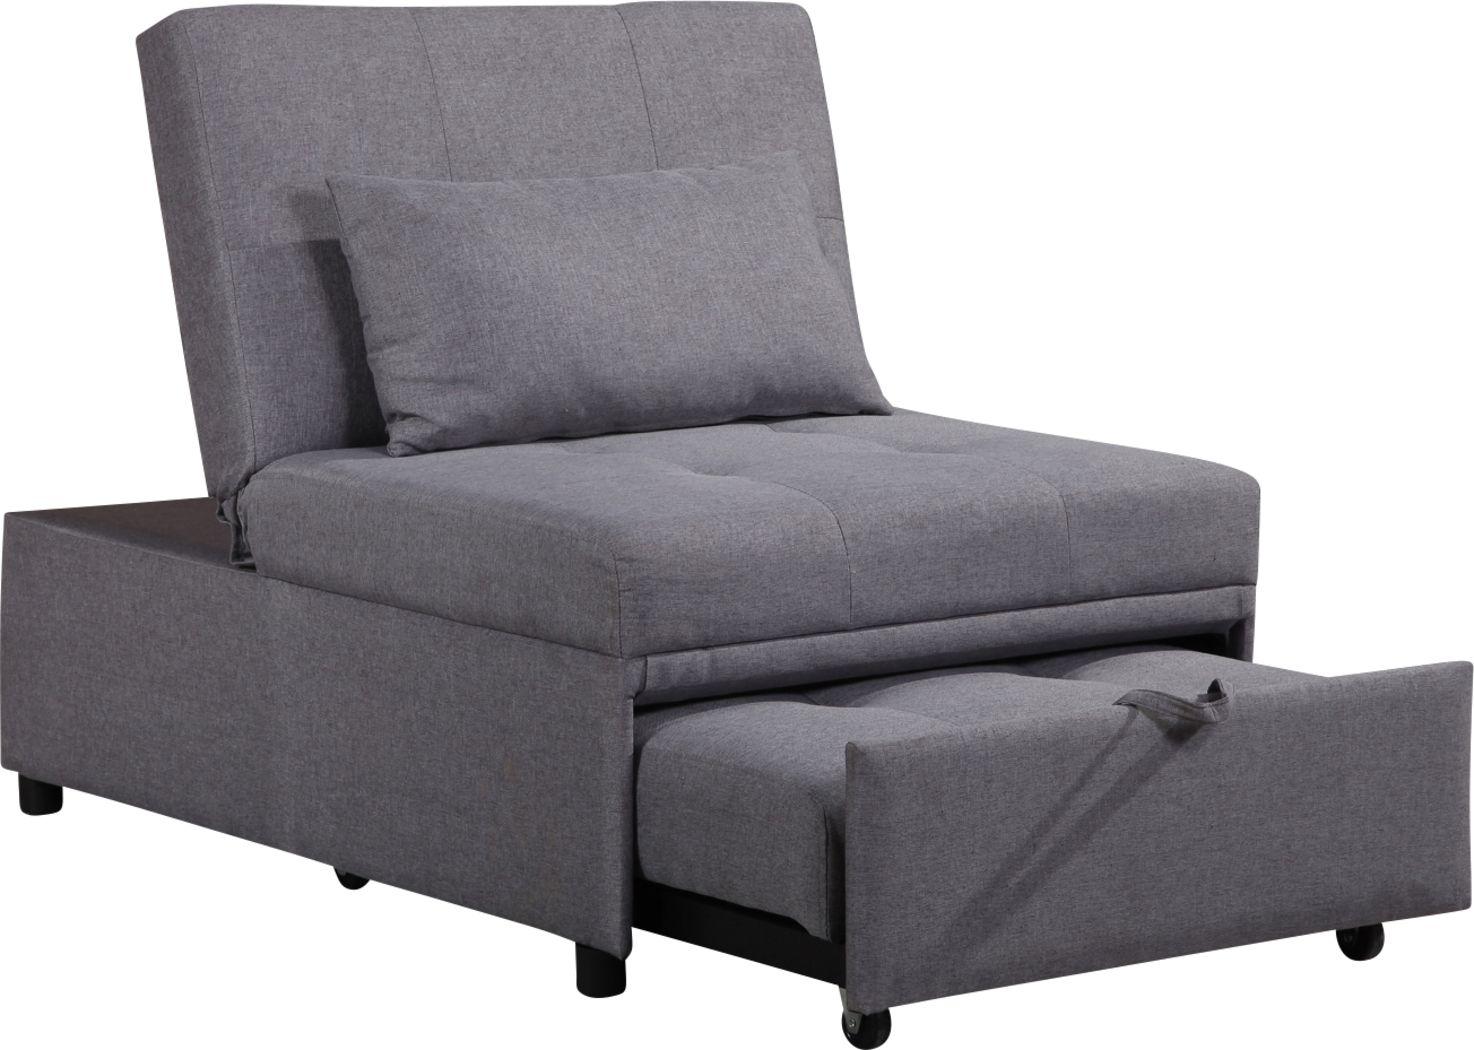 Denvir Gray Convertible Chair